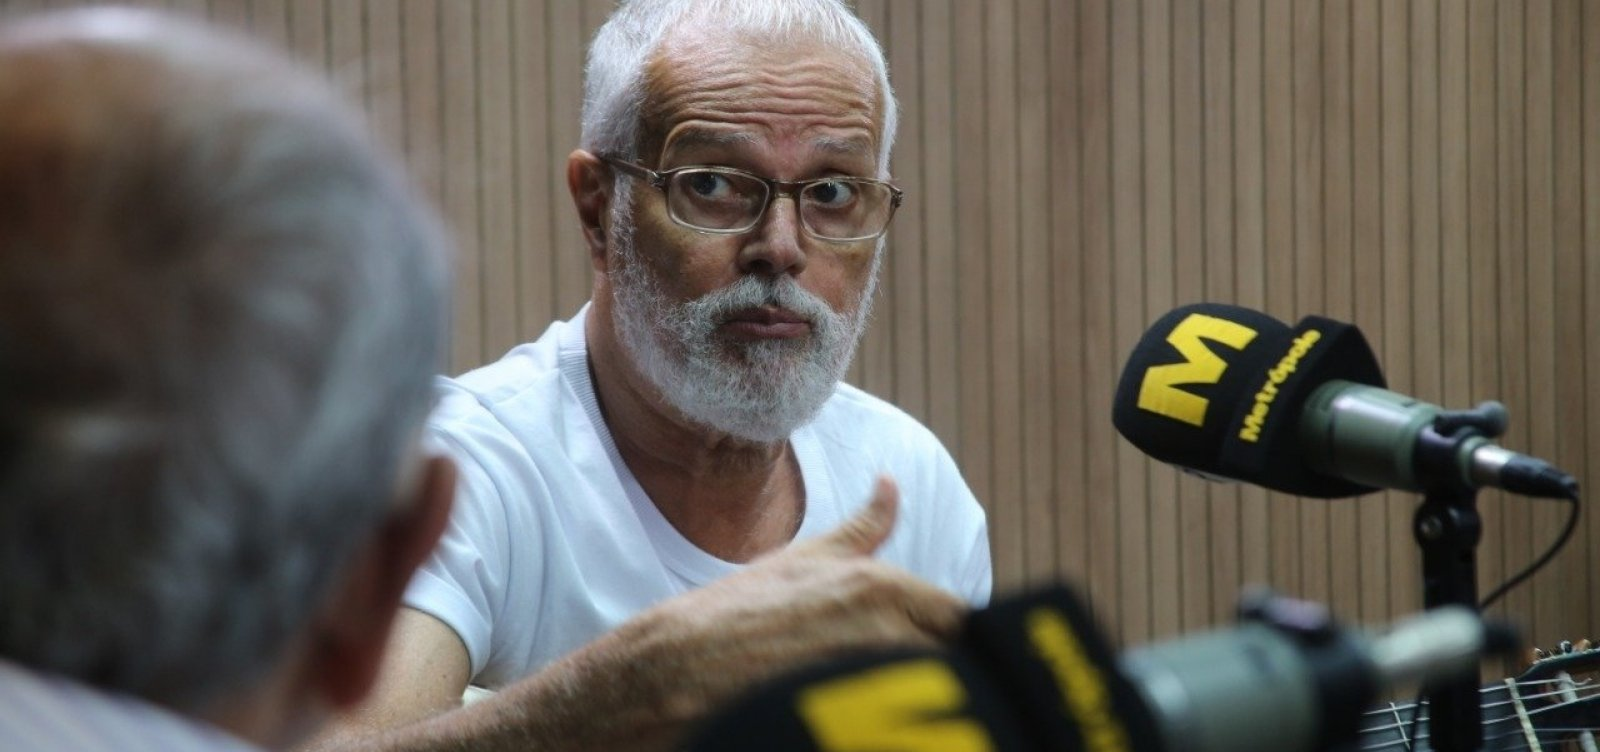 [Roberto Mendes lamenta ataque a igreja de Santo Amaro: 'Jogaram (óleo) na nossa alma']